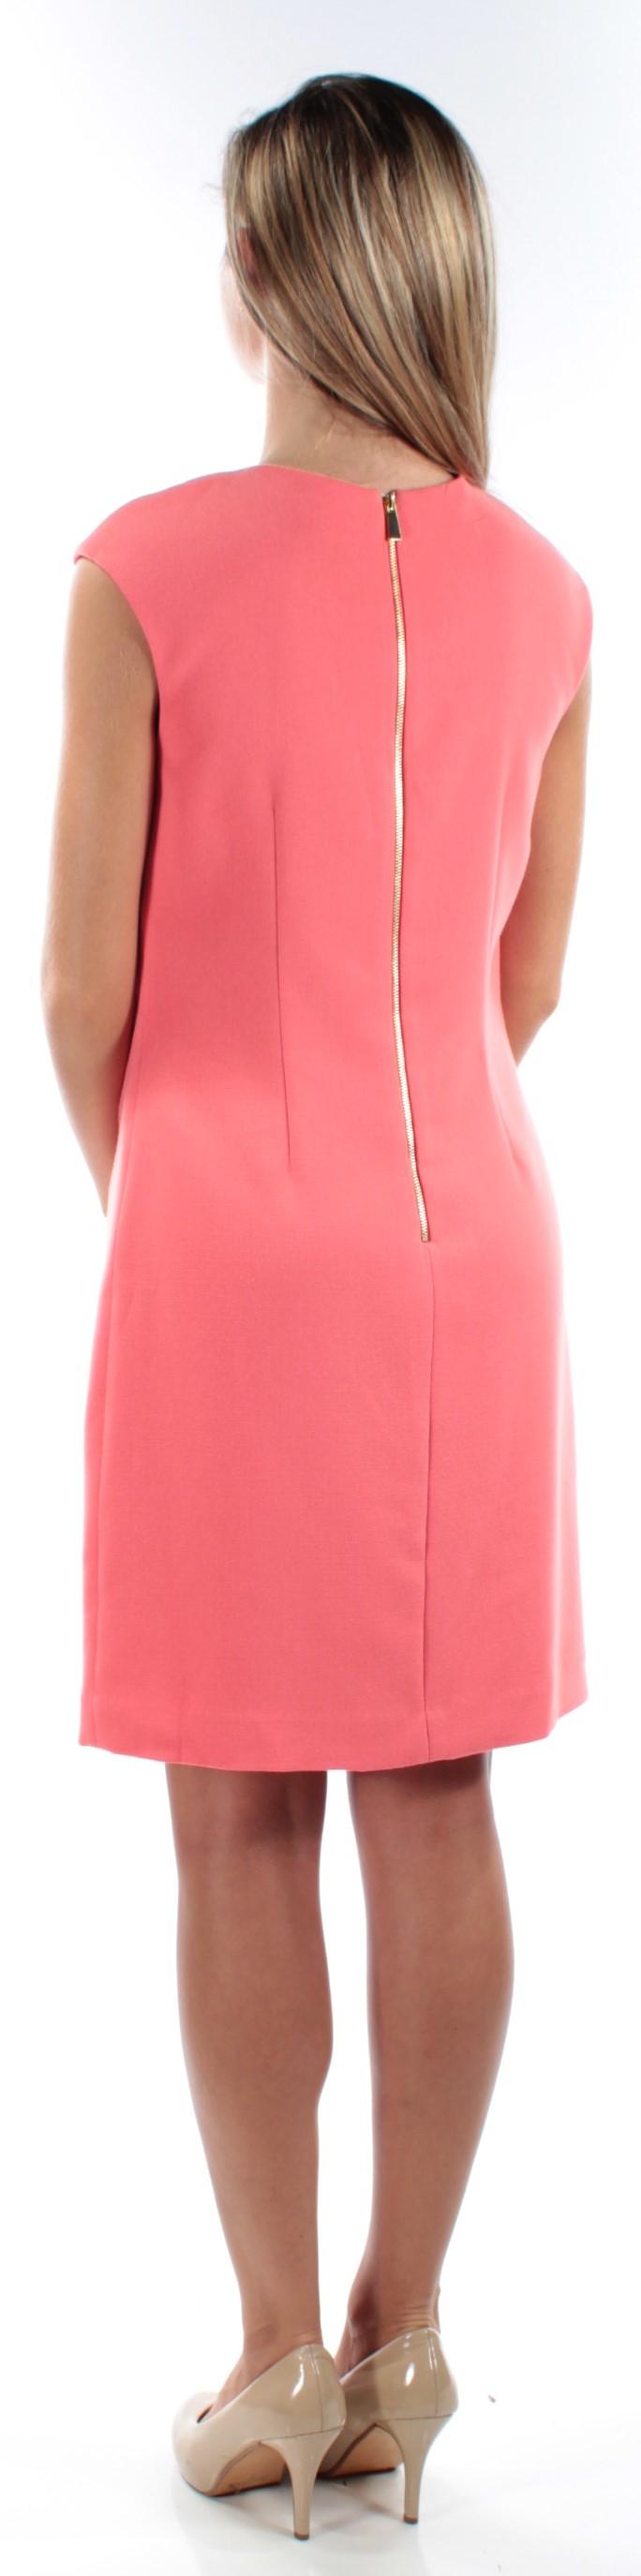 b14c1344d16e VINCE CAMUTO $168 Womens 1160 Coral Cap Sleeve Shift Party Dress 10 ...